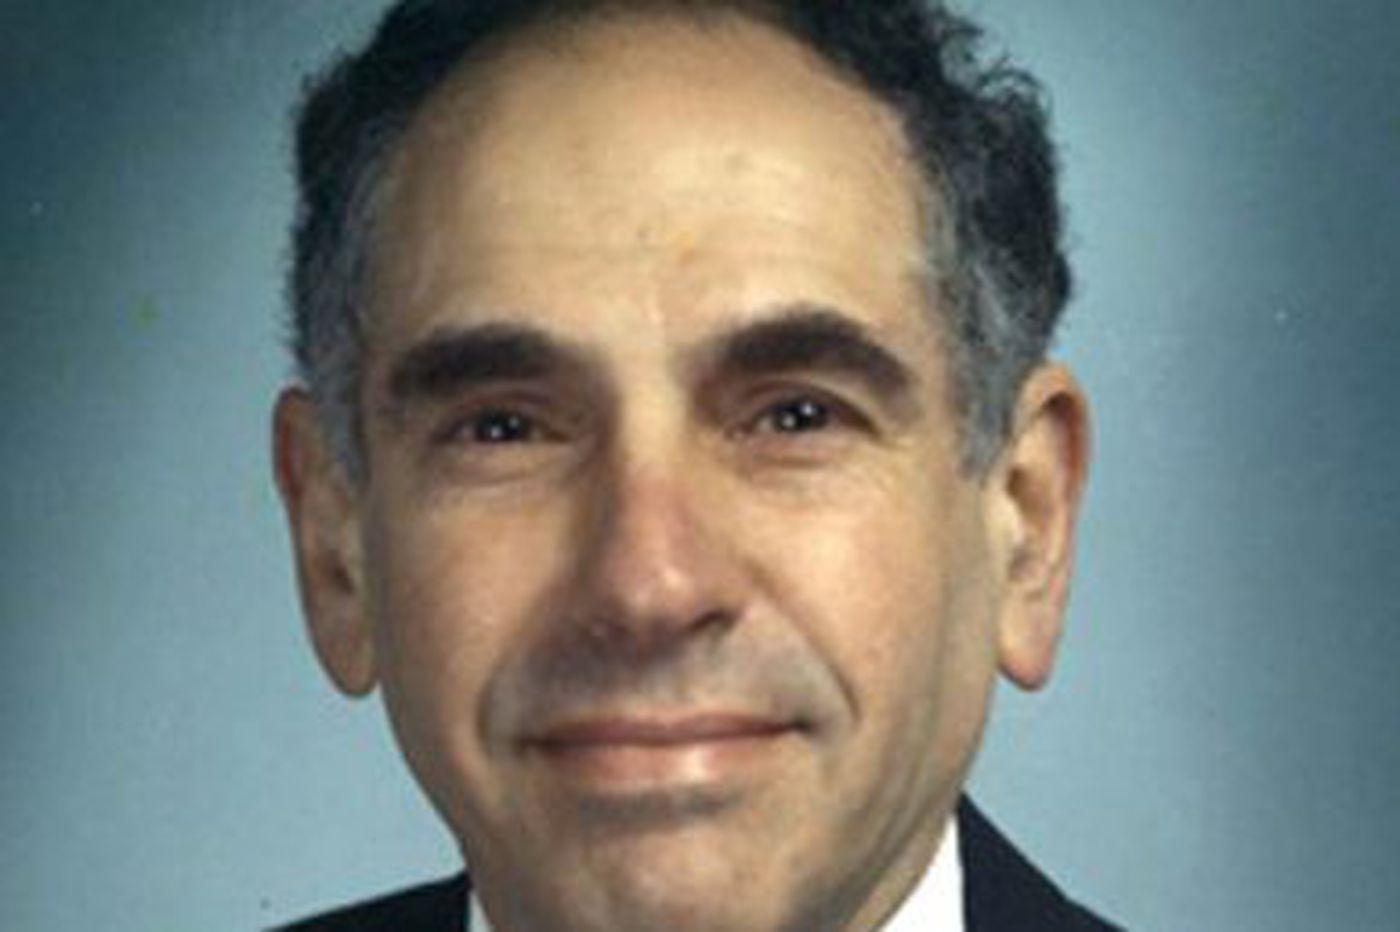 Federal judges rule in favor of Pennsylvania Republicans in gerrymandering case